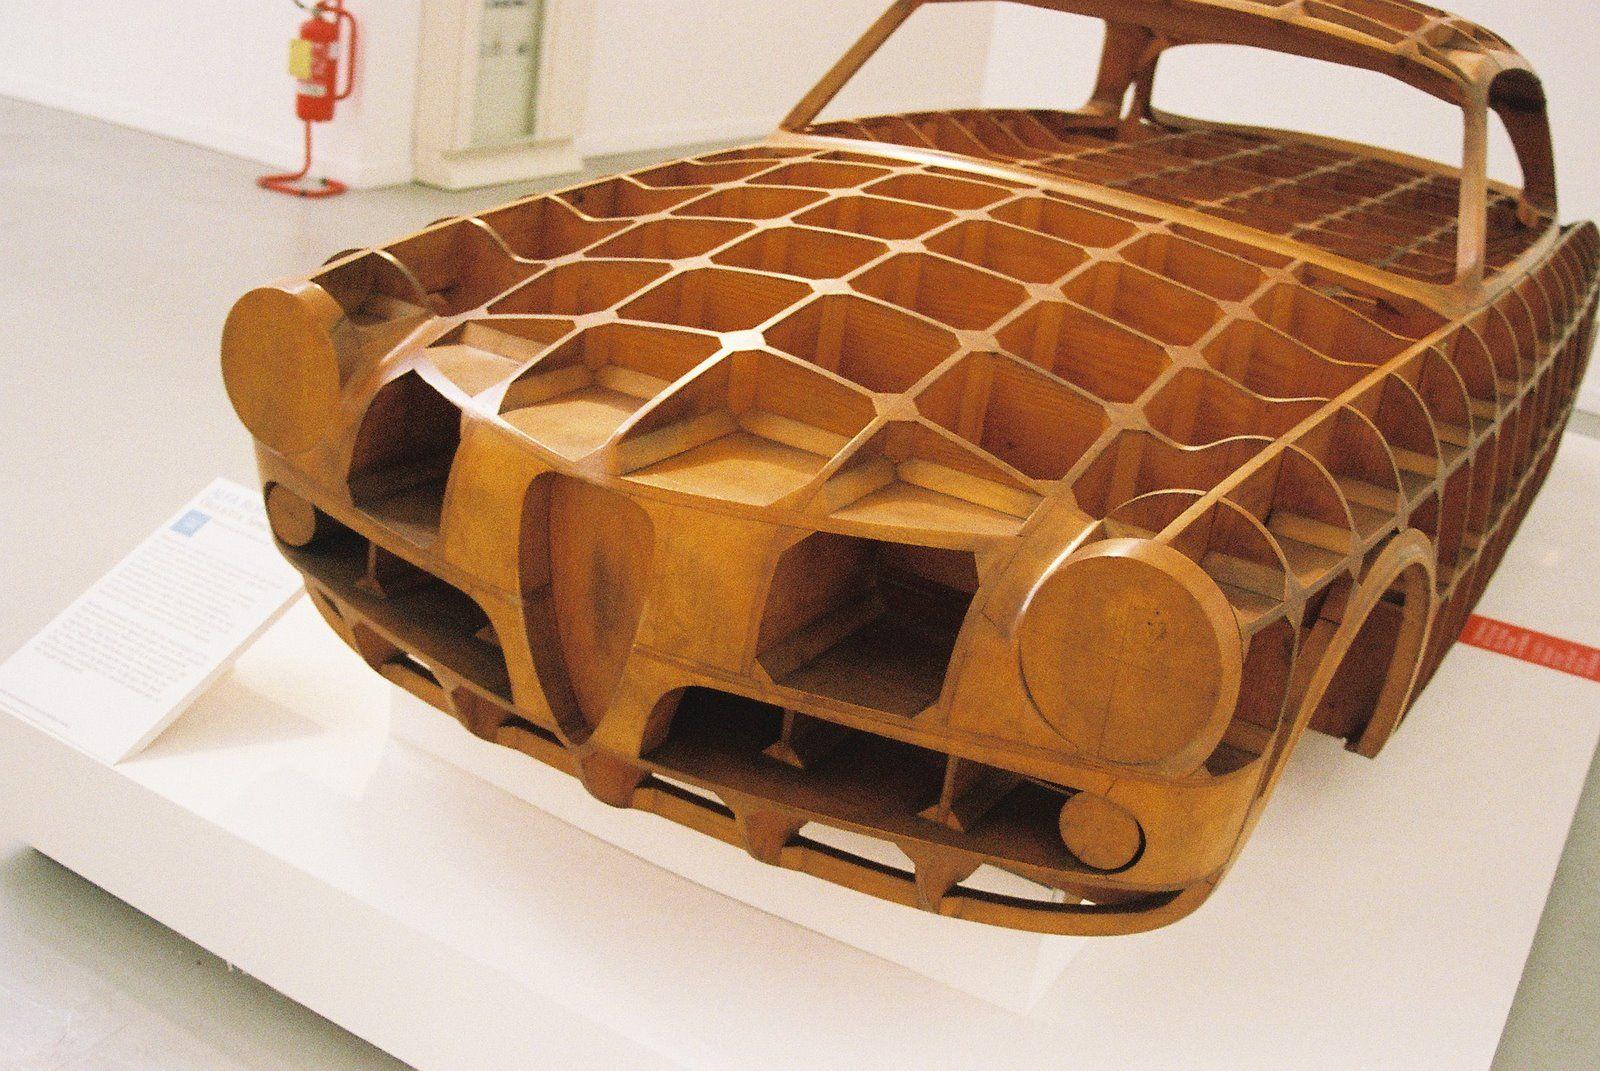 Body Panel Form For Alfa Romeo Perhaps For An Early Giulietta - Alfa romeo body panels